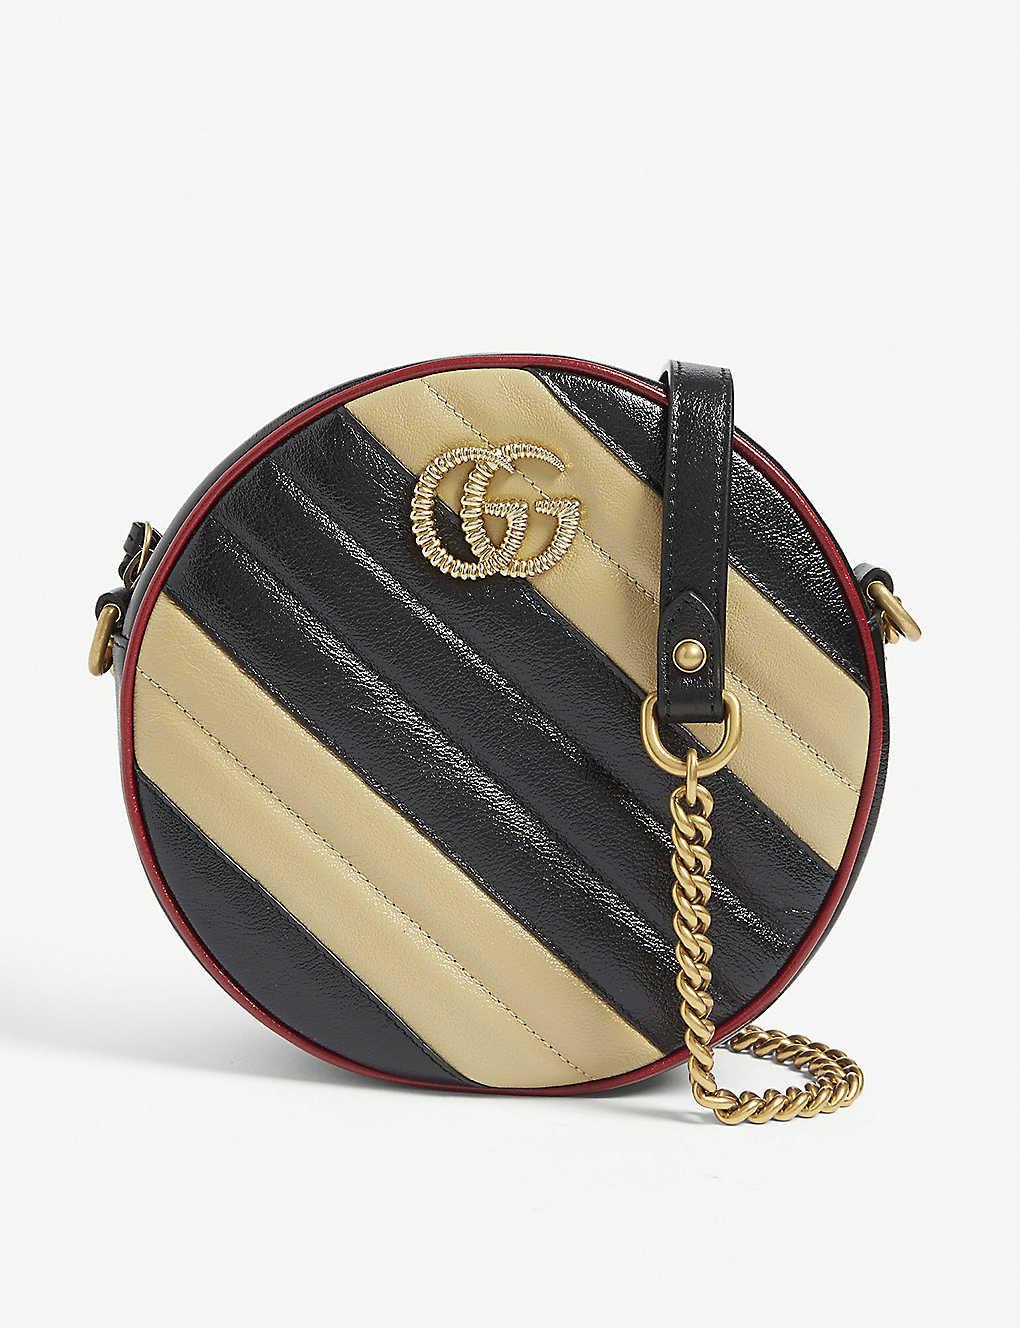 de7aa9734 GG Marmont mini leather shoulder bag - Nero diagonal beige ...